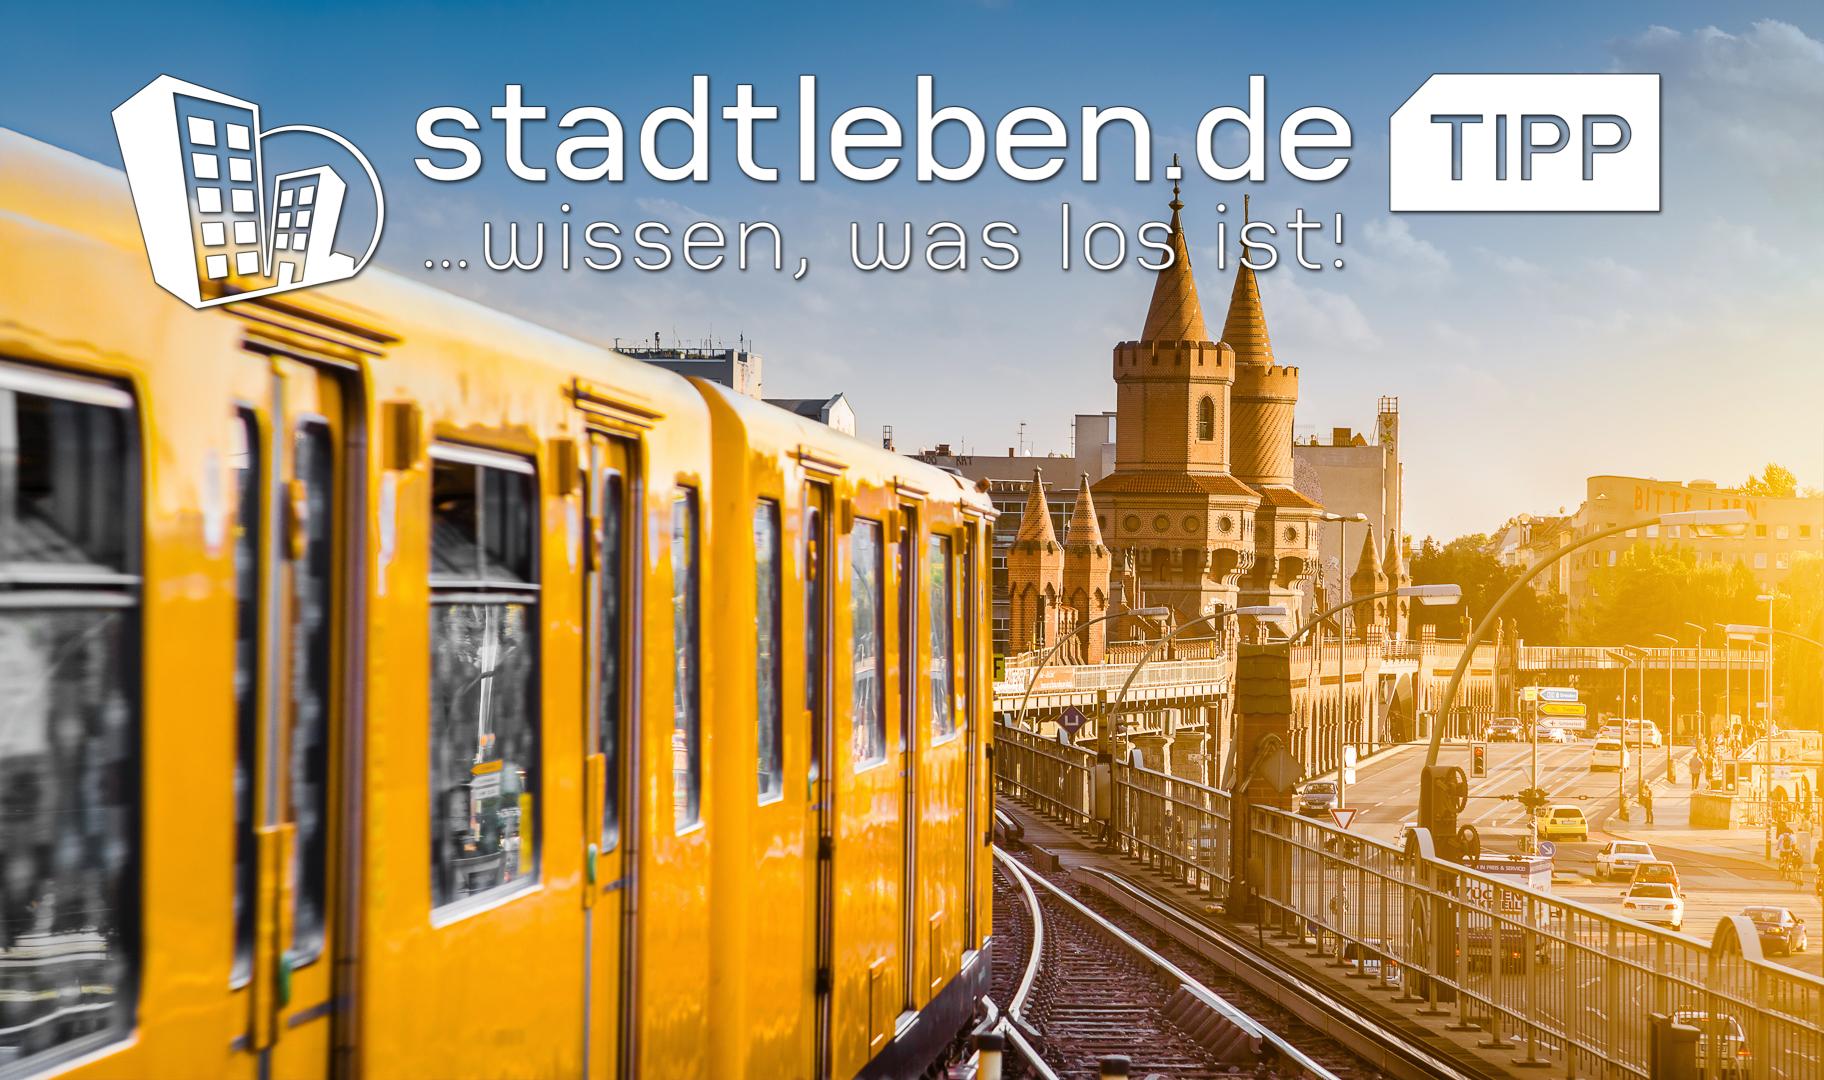 Berlin, Gebäude, Autos, Straßenbahn, Gleise, Himmel